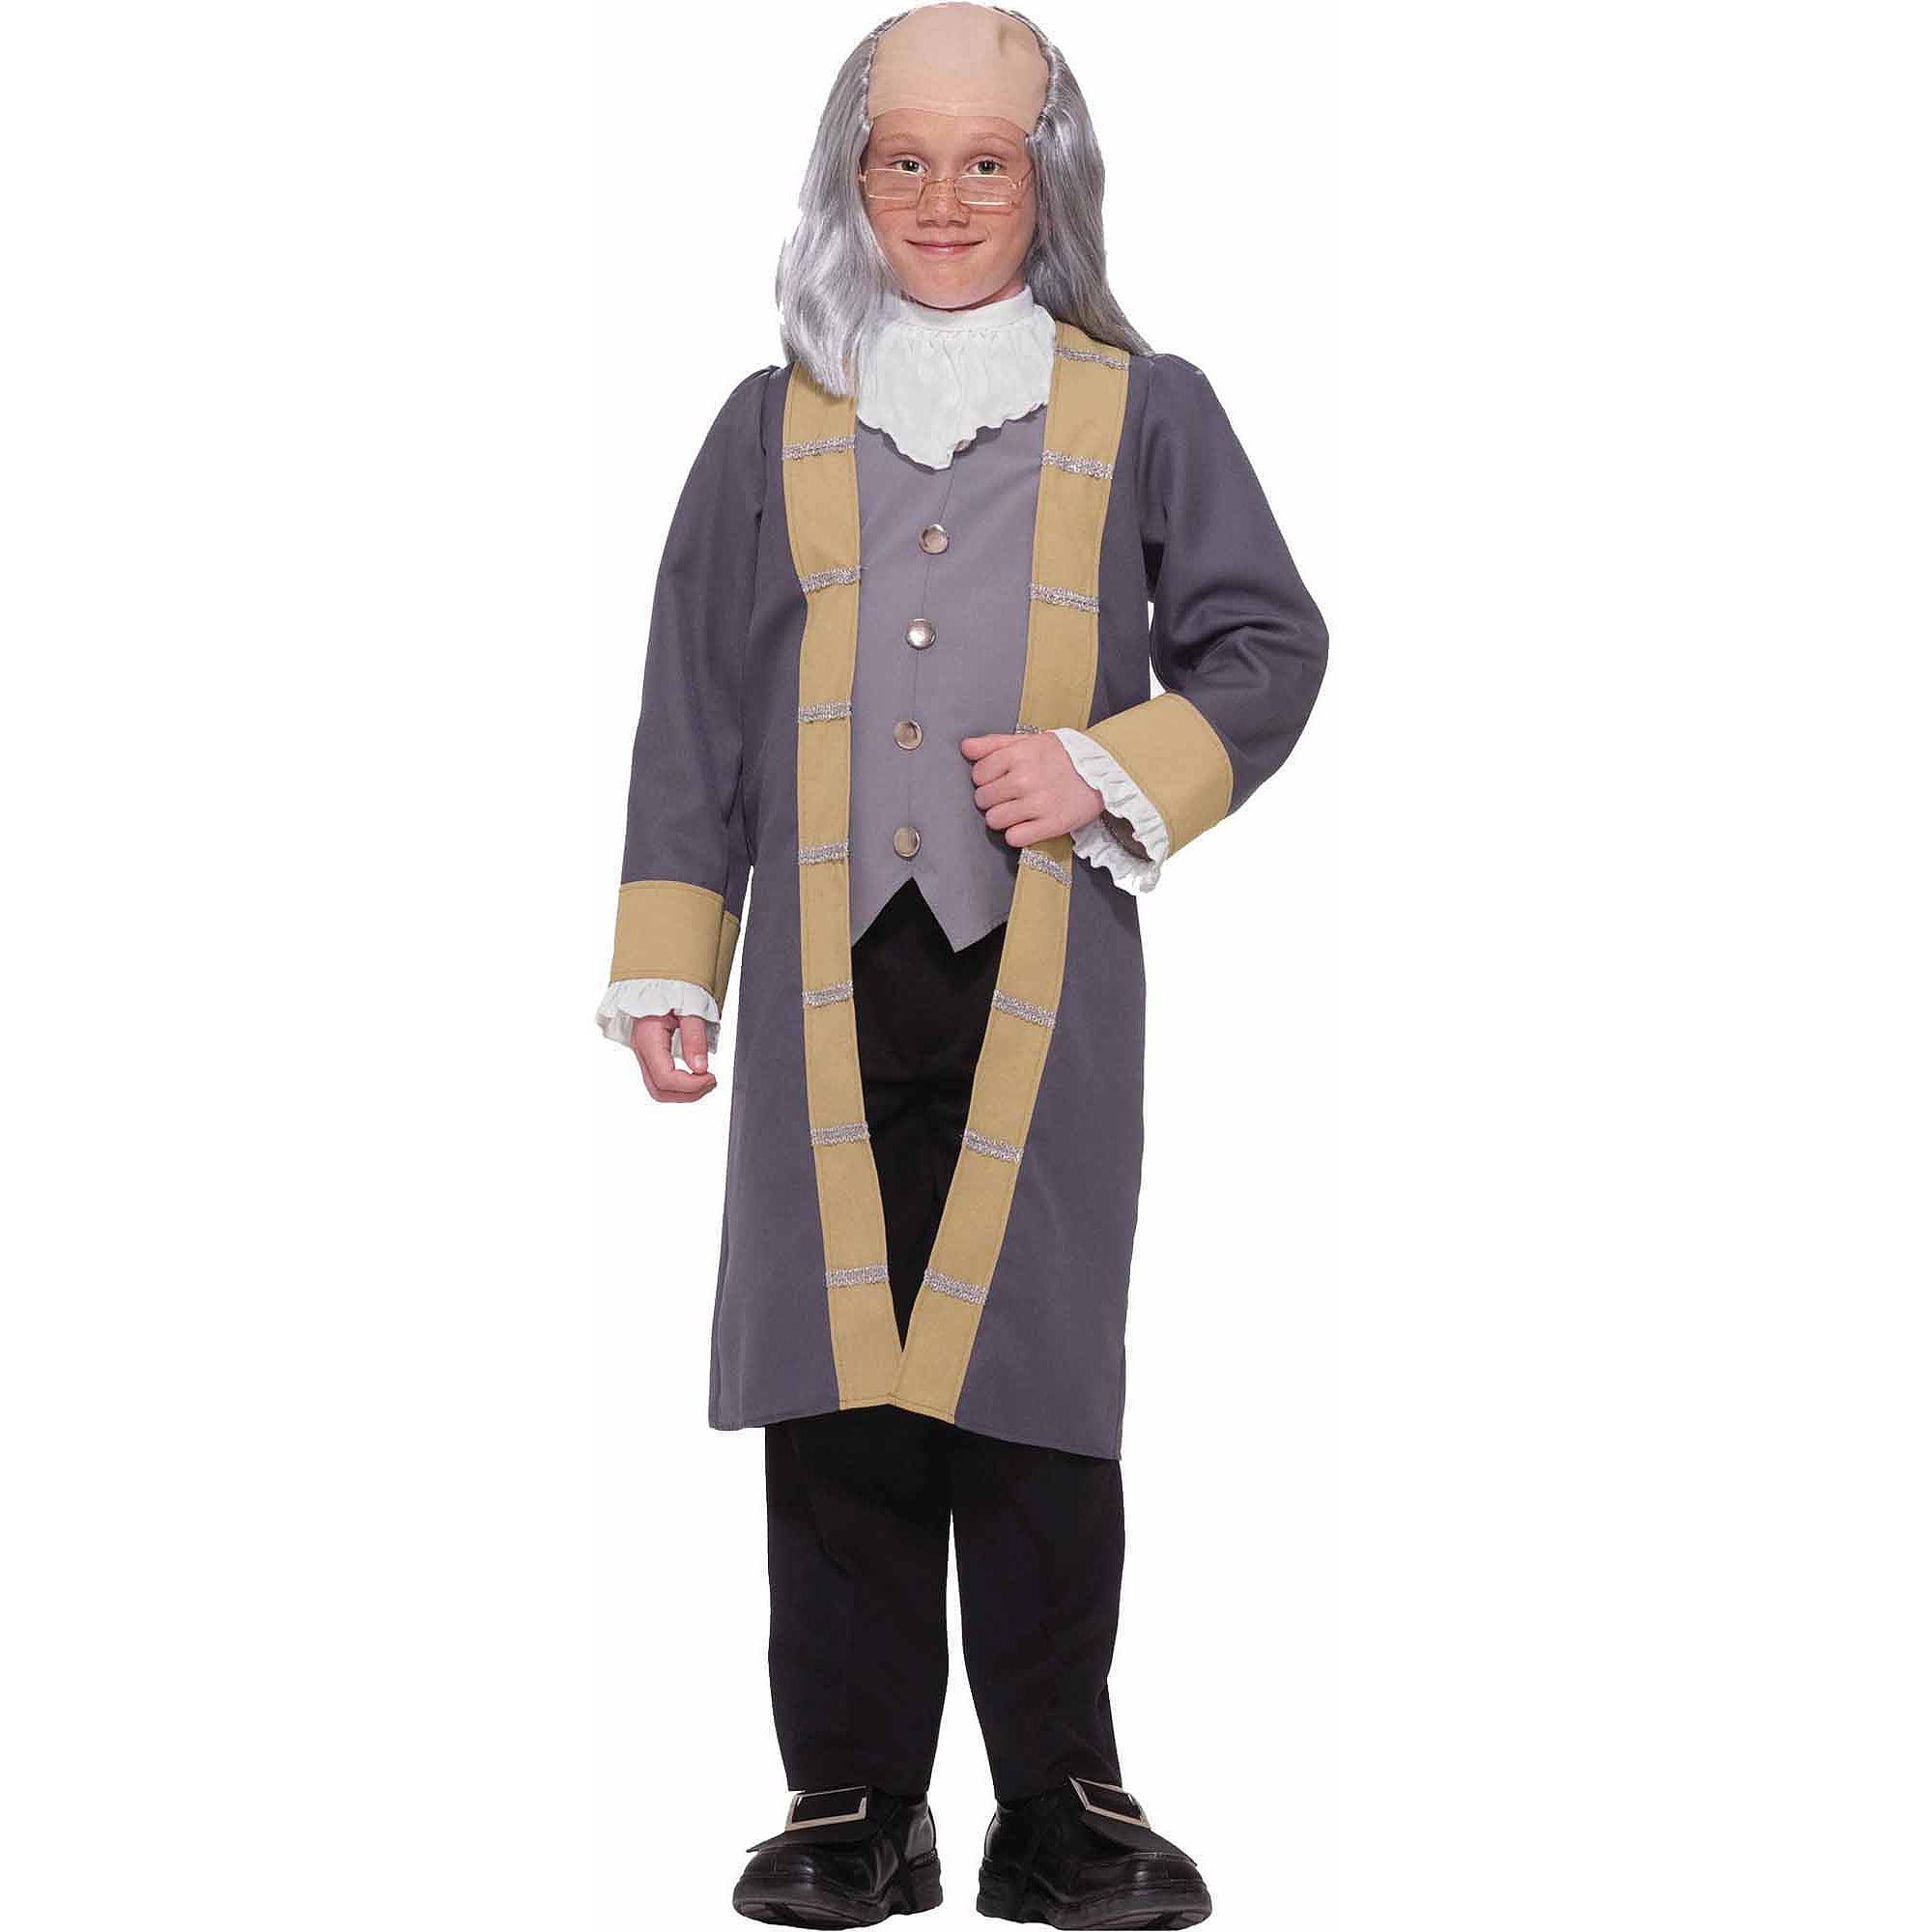 style 6441 dress up dolls